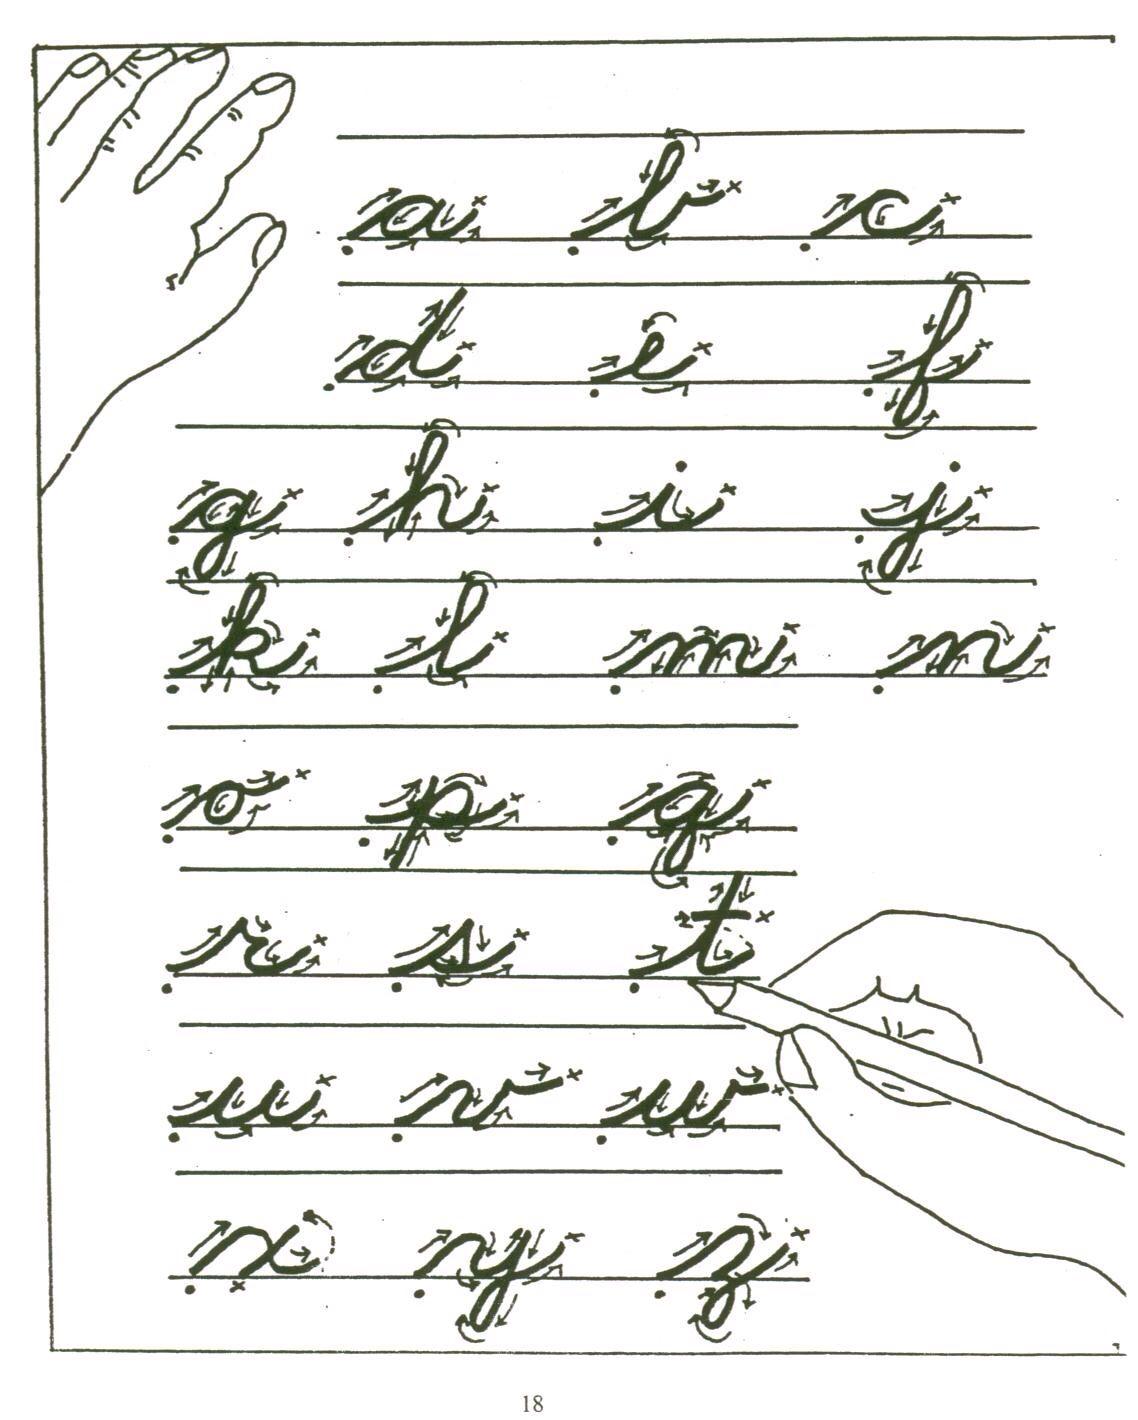 Practice Hand Writing